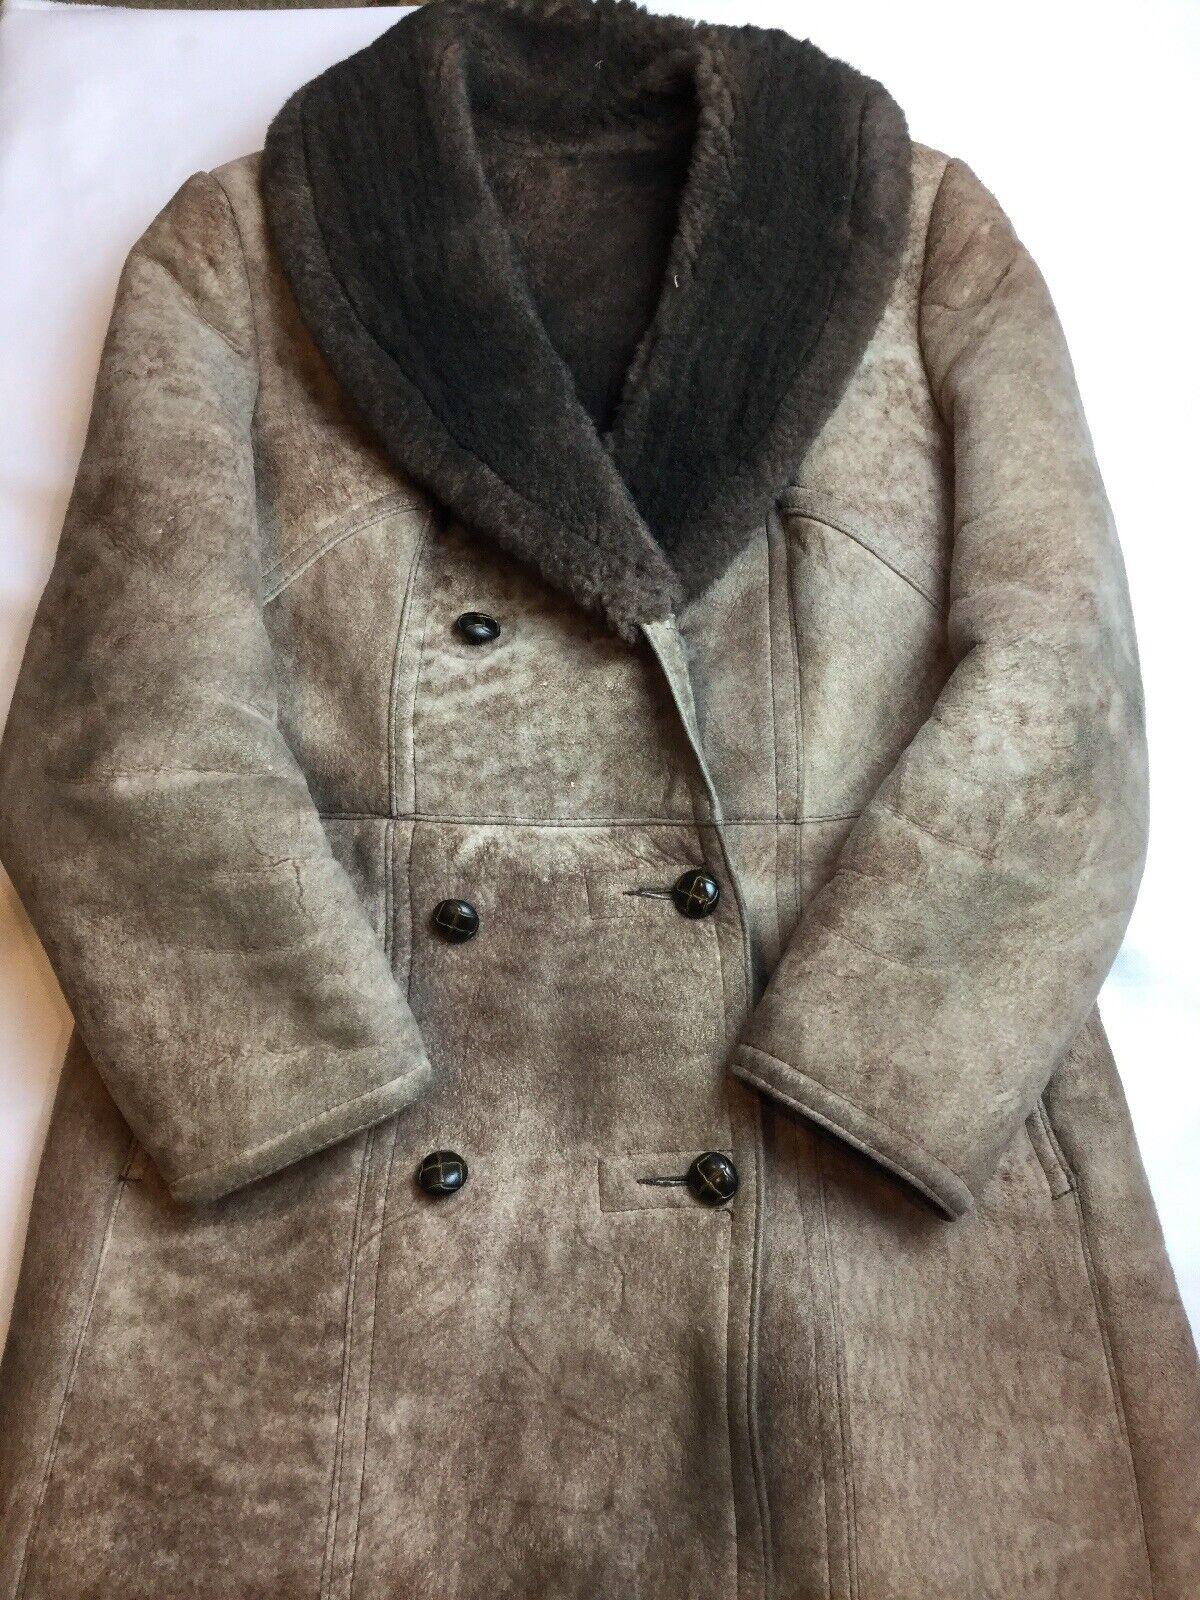 Vintage Lawrence Shearling Coat Full Length Large… - image 1